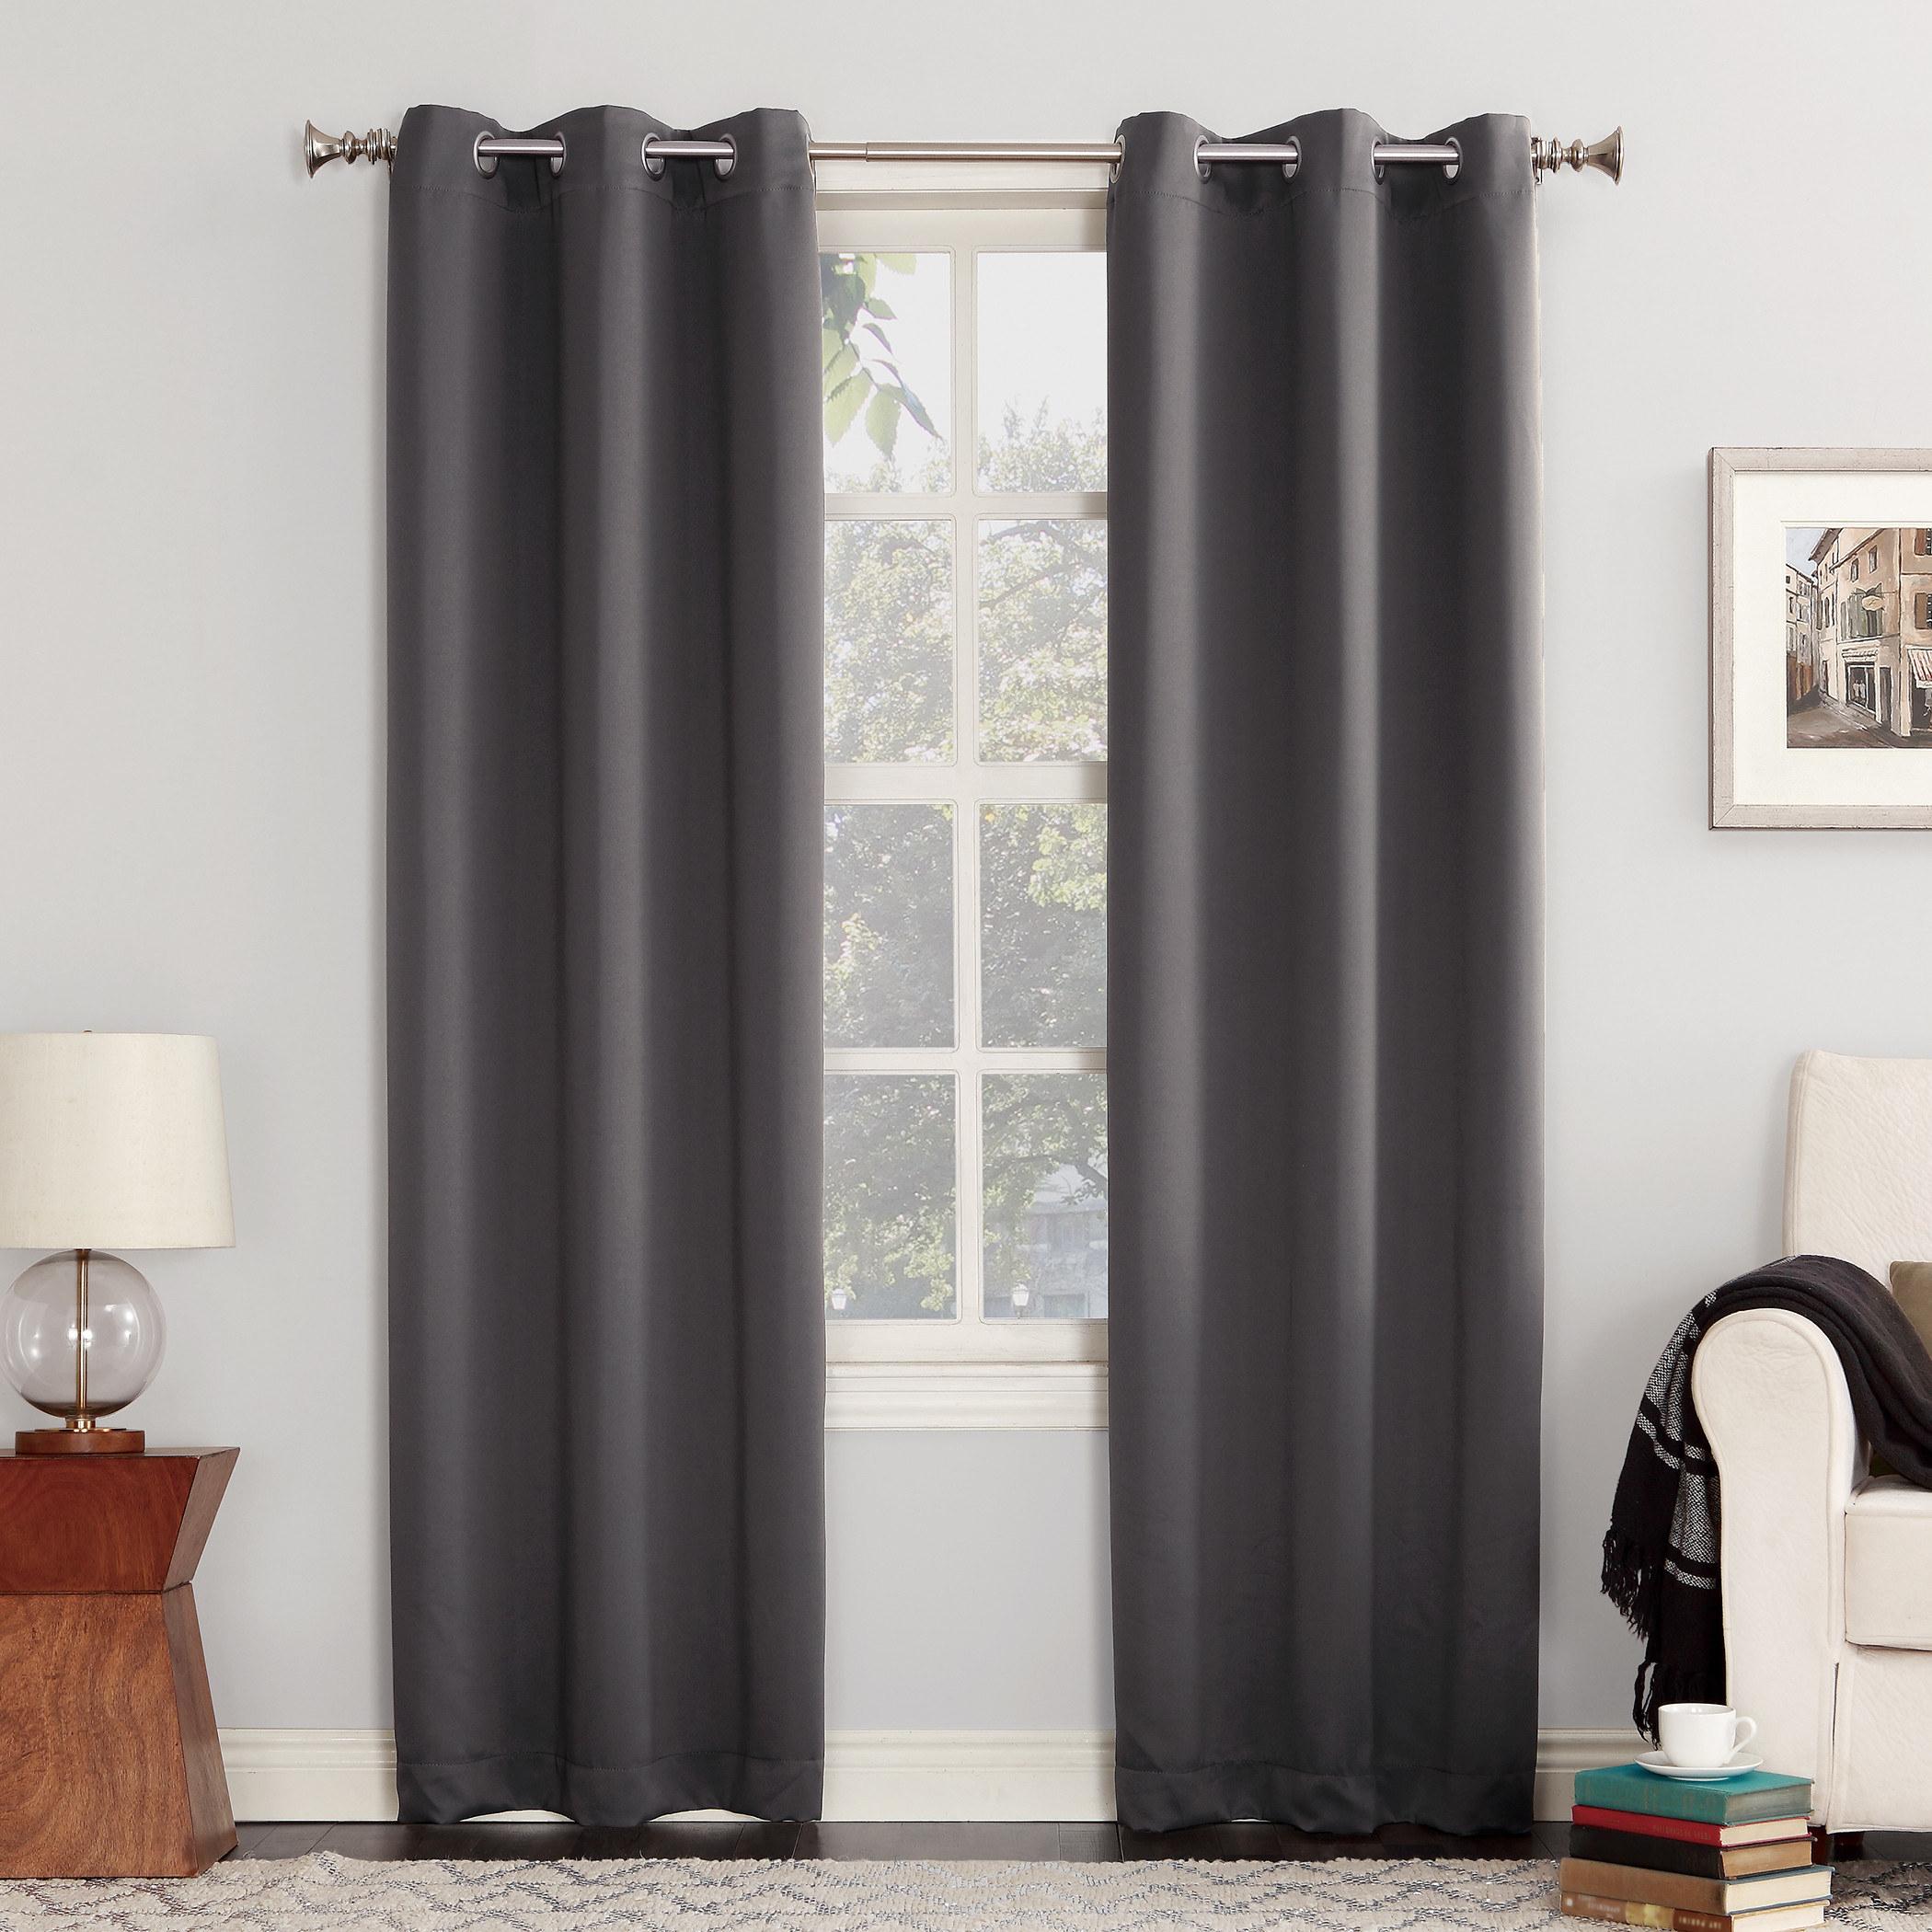 The charcoalenergy-efficient blackout grommet curtain panel